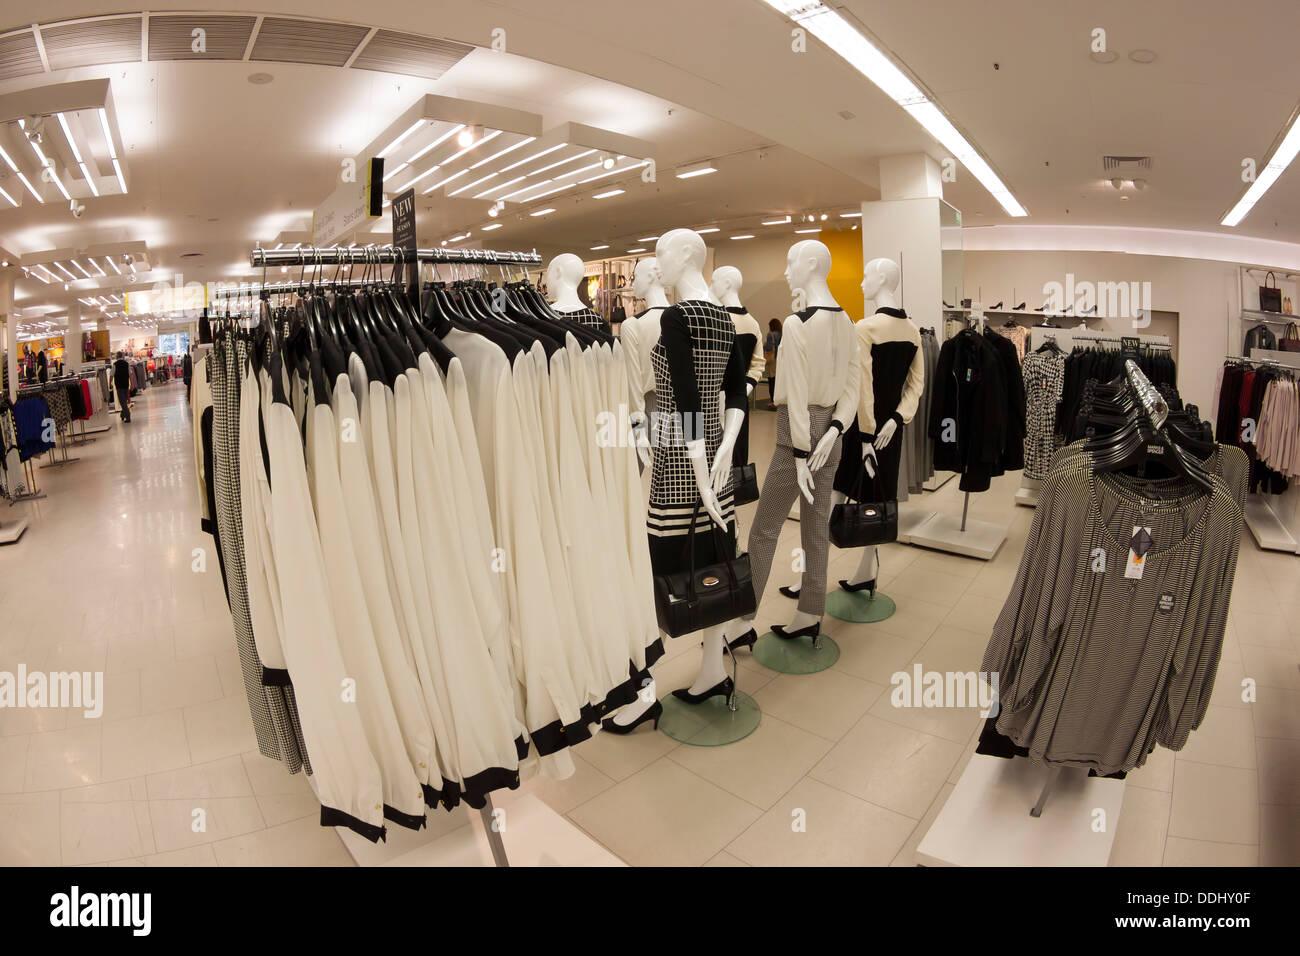 d3f2f19e18 Ladies Fashion Stock Photos & Ladies Fashion Stock Images - Alamy